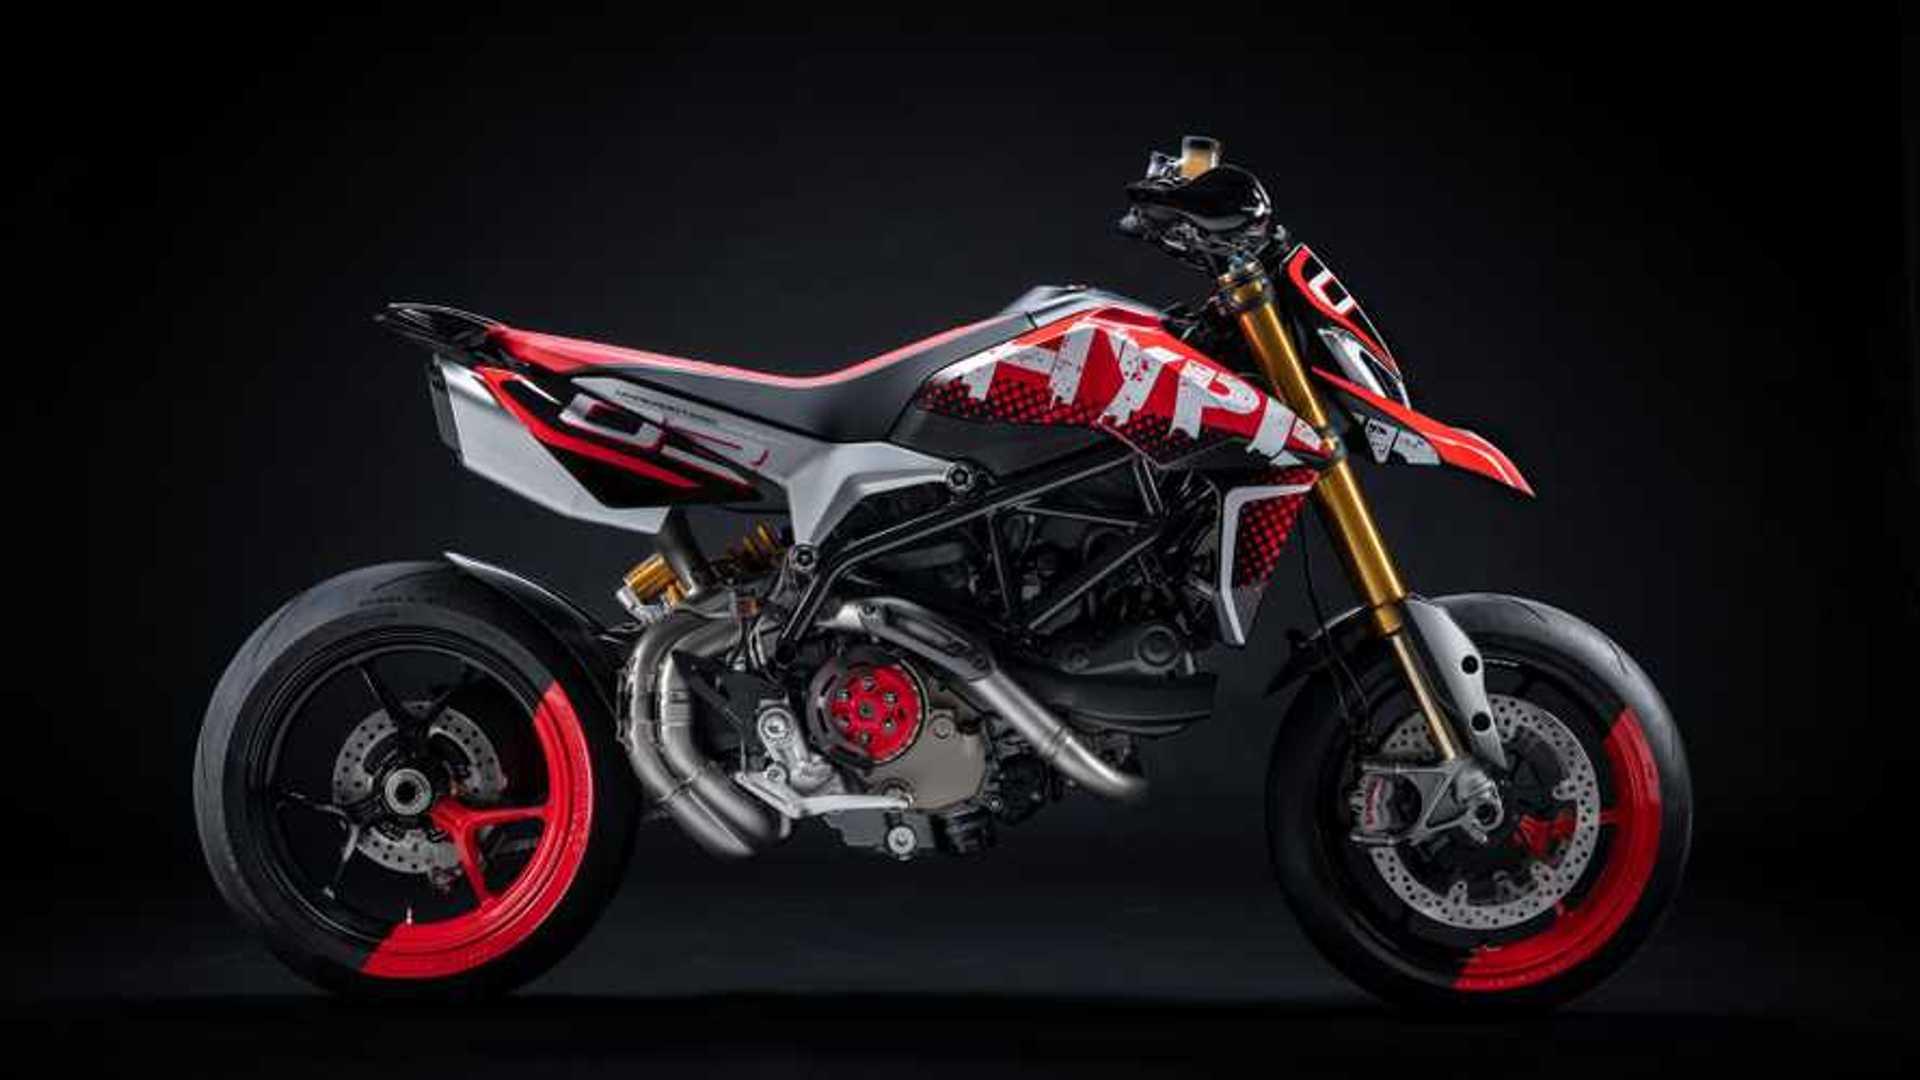 Ducati Hypermotard Concept Wins Best In Class